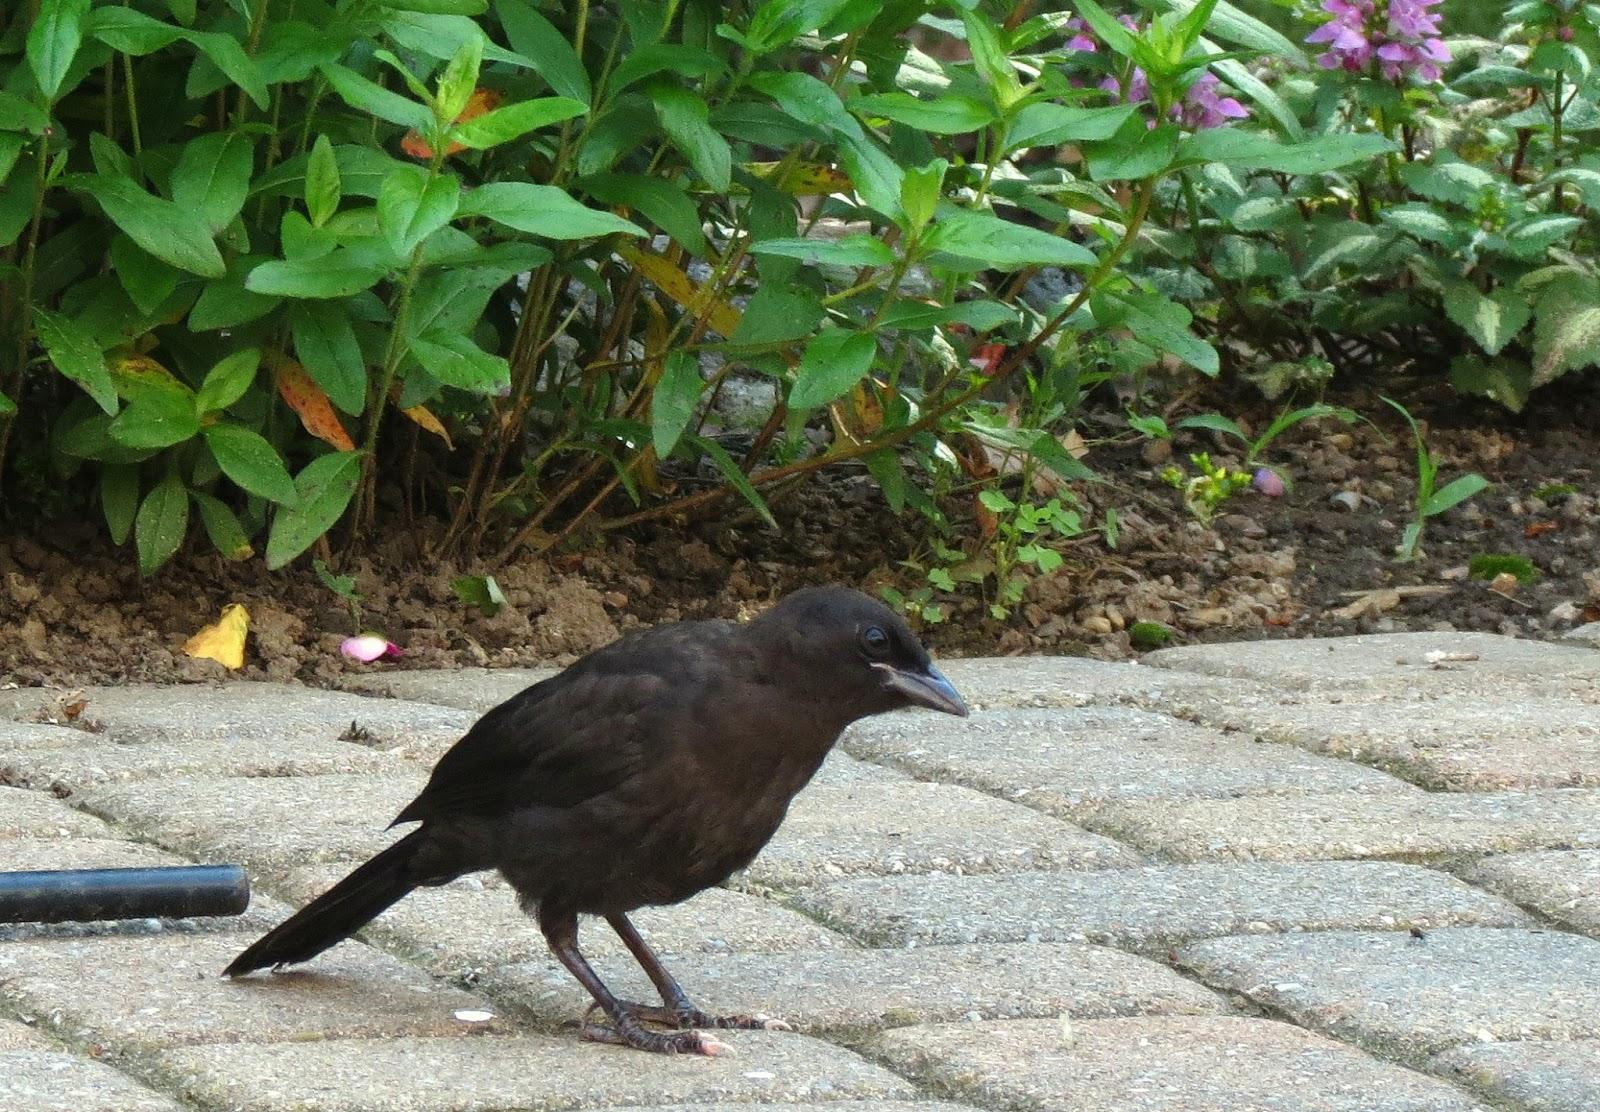 fledgling grackle - photo #13